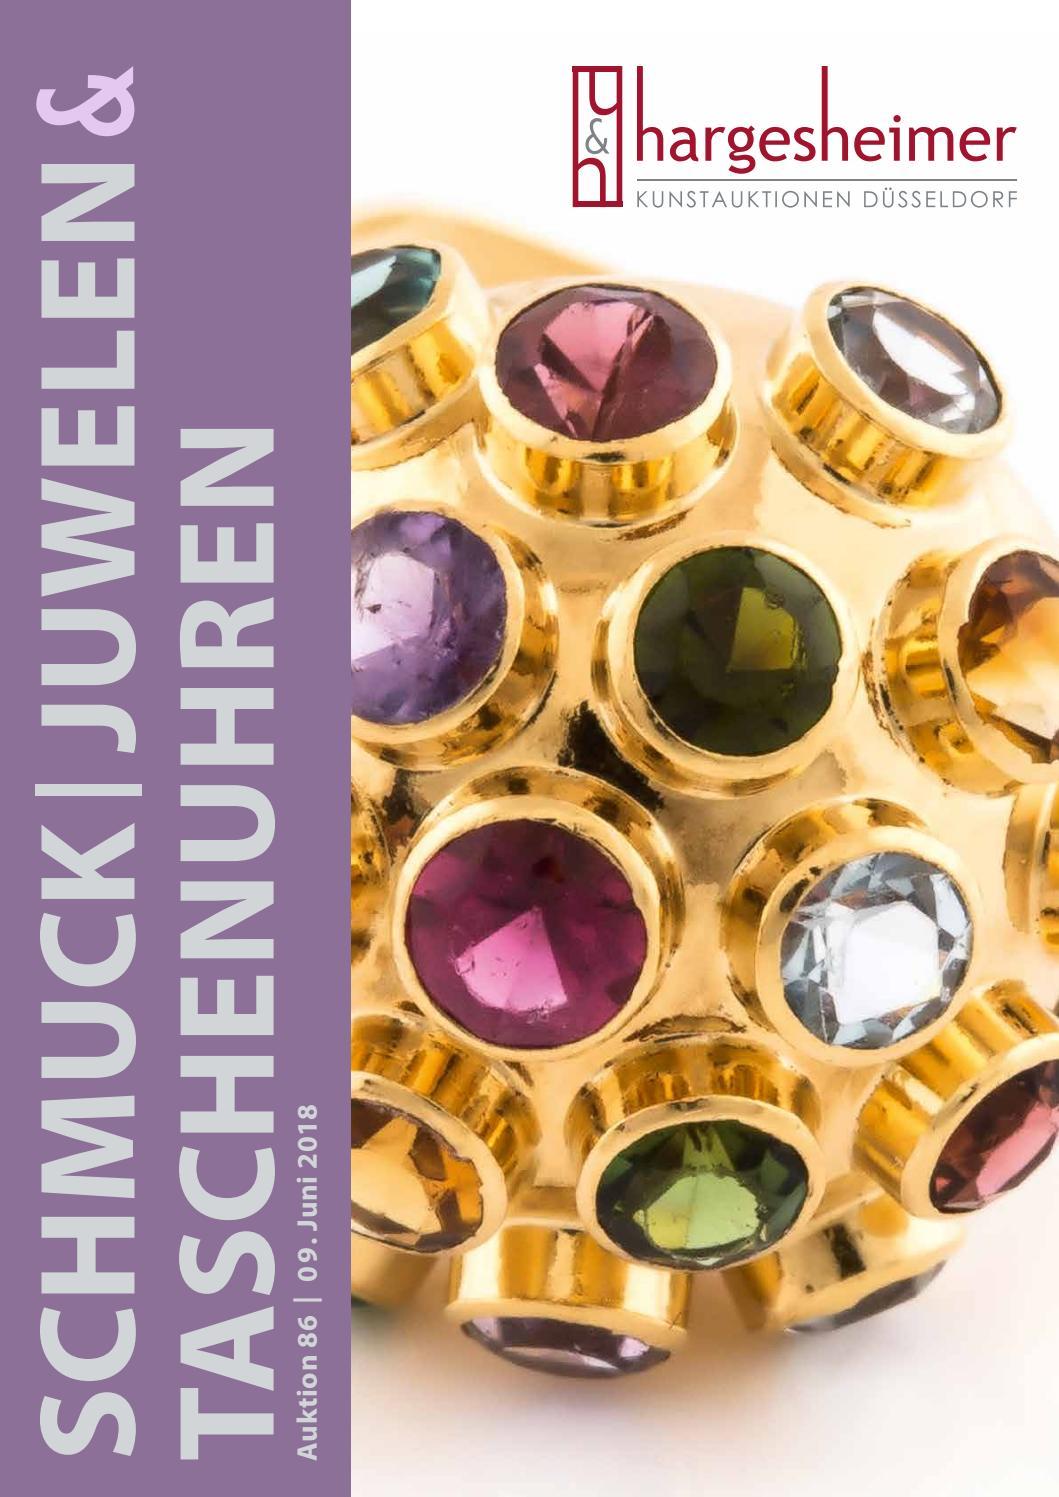 Armband Armschmuck Schmuckmetall Steinbesatz Antik Barock Stil